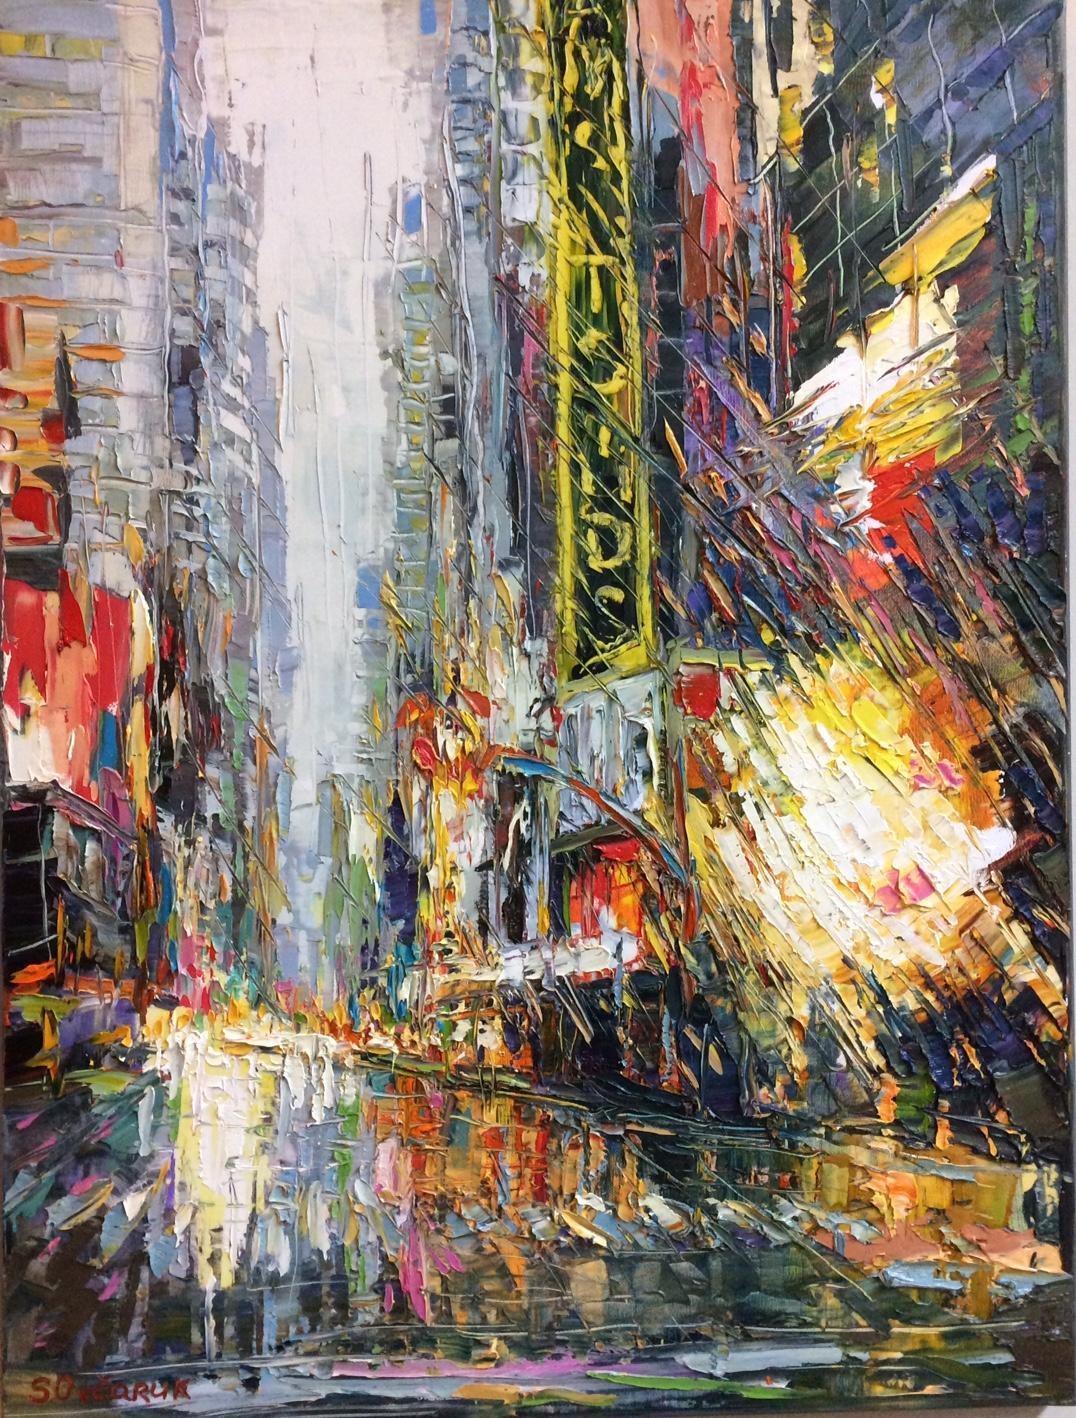 Music of the Rain, original 31x24 abstract impressionist landscape